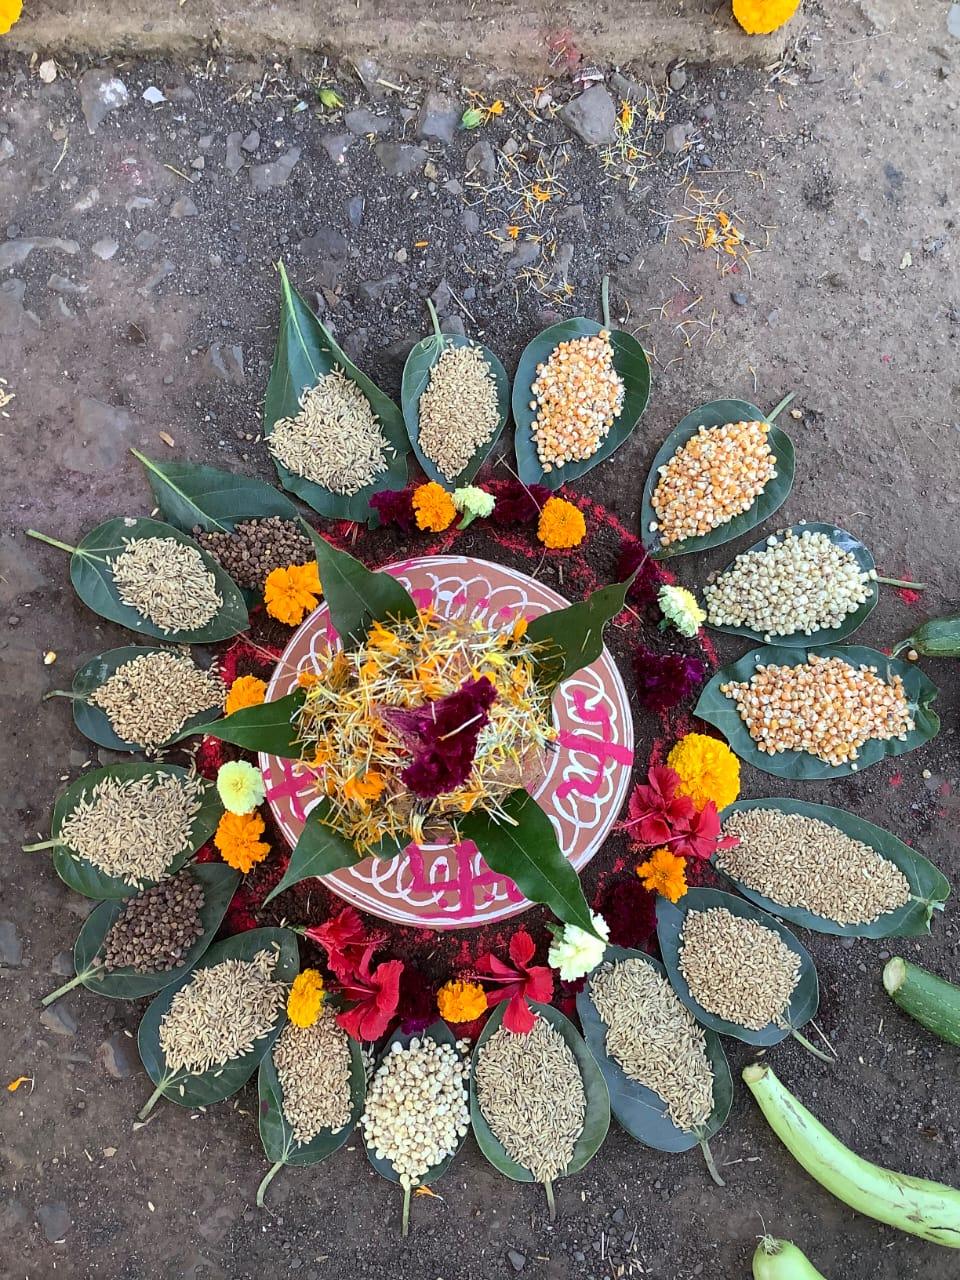 vaagdhara-world-soil-day-2020-11